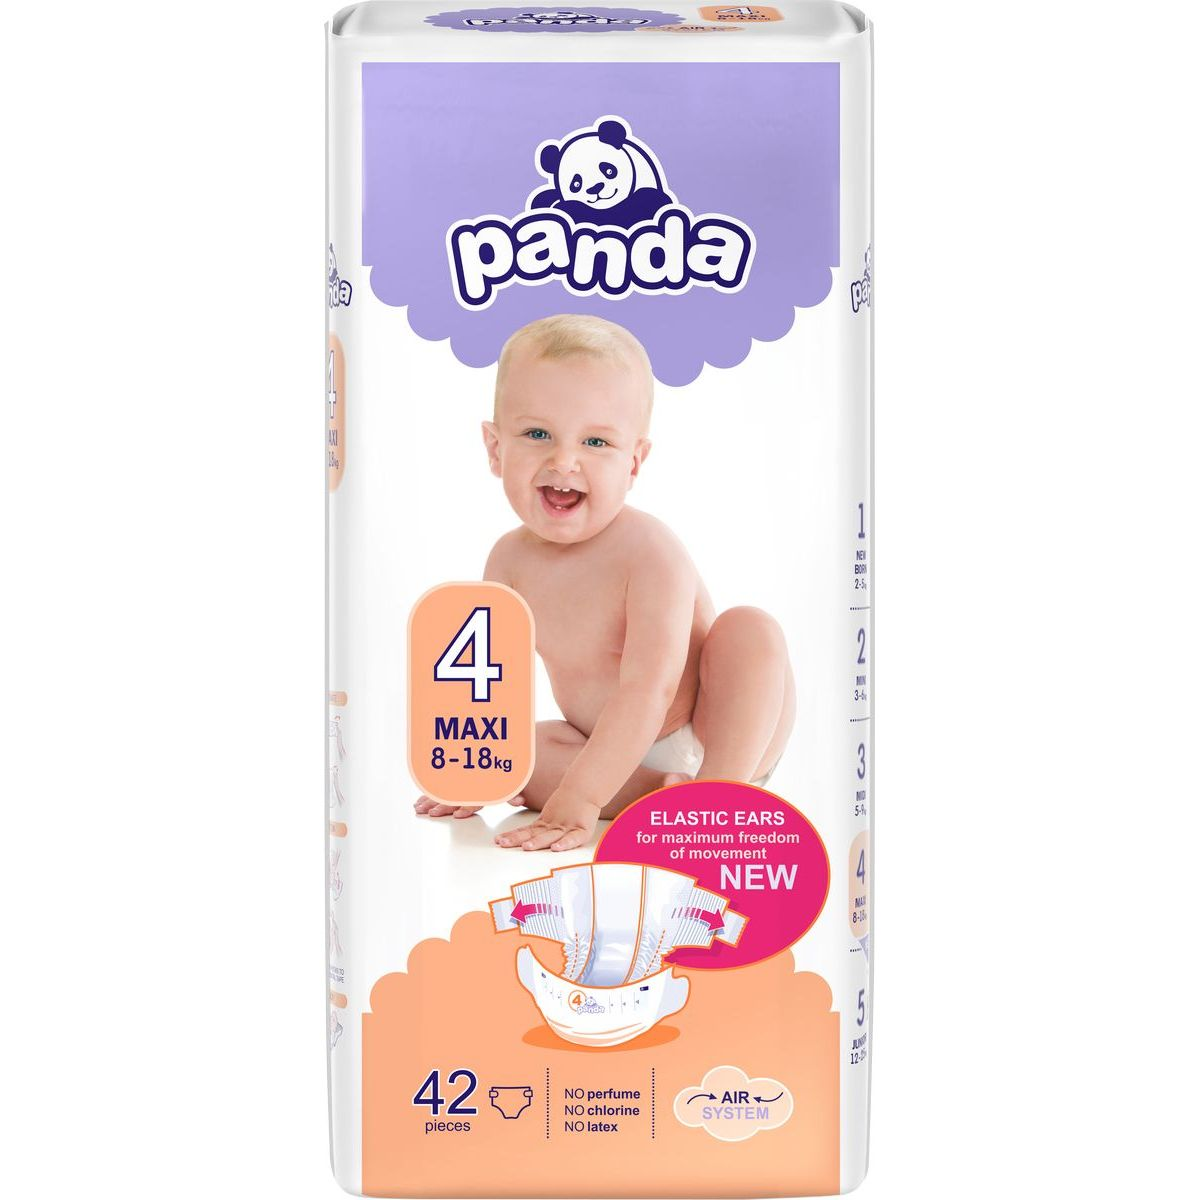 Panda dětské plenky Maxi á 42 ks